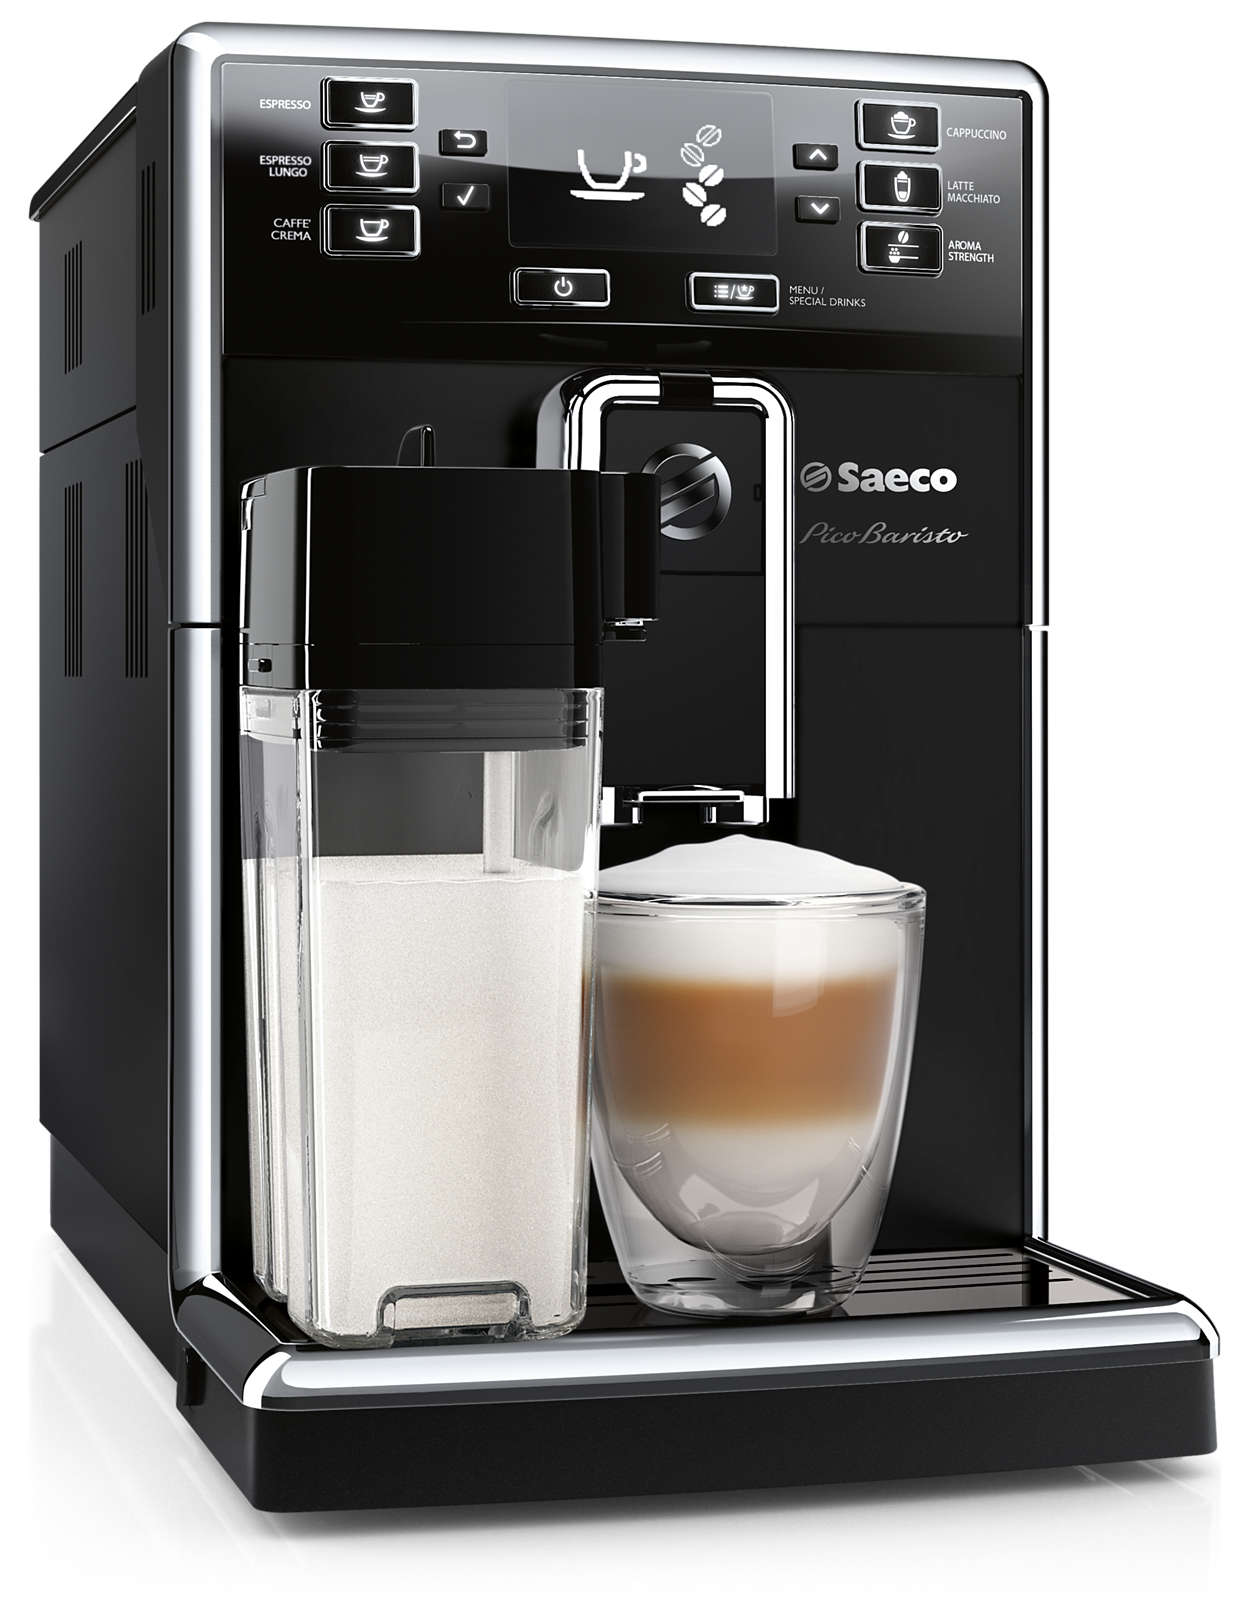 saeco picobaristo hd8925 ontkalken espresso ontkalken. Black Bedroom Furniture Sets. Home Design Ideas